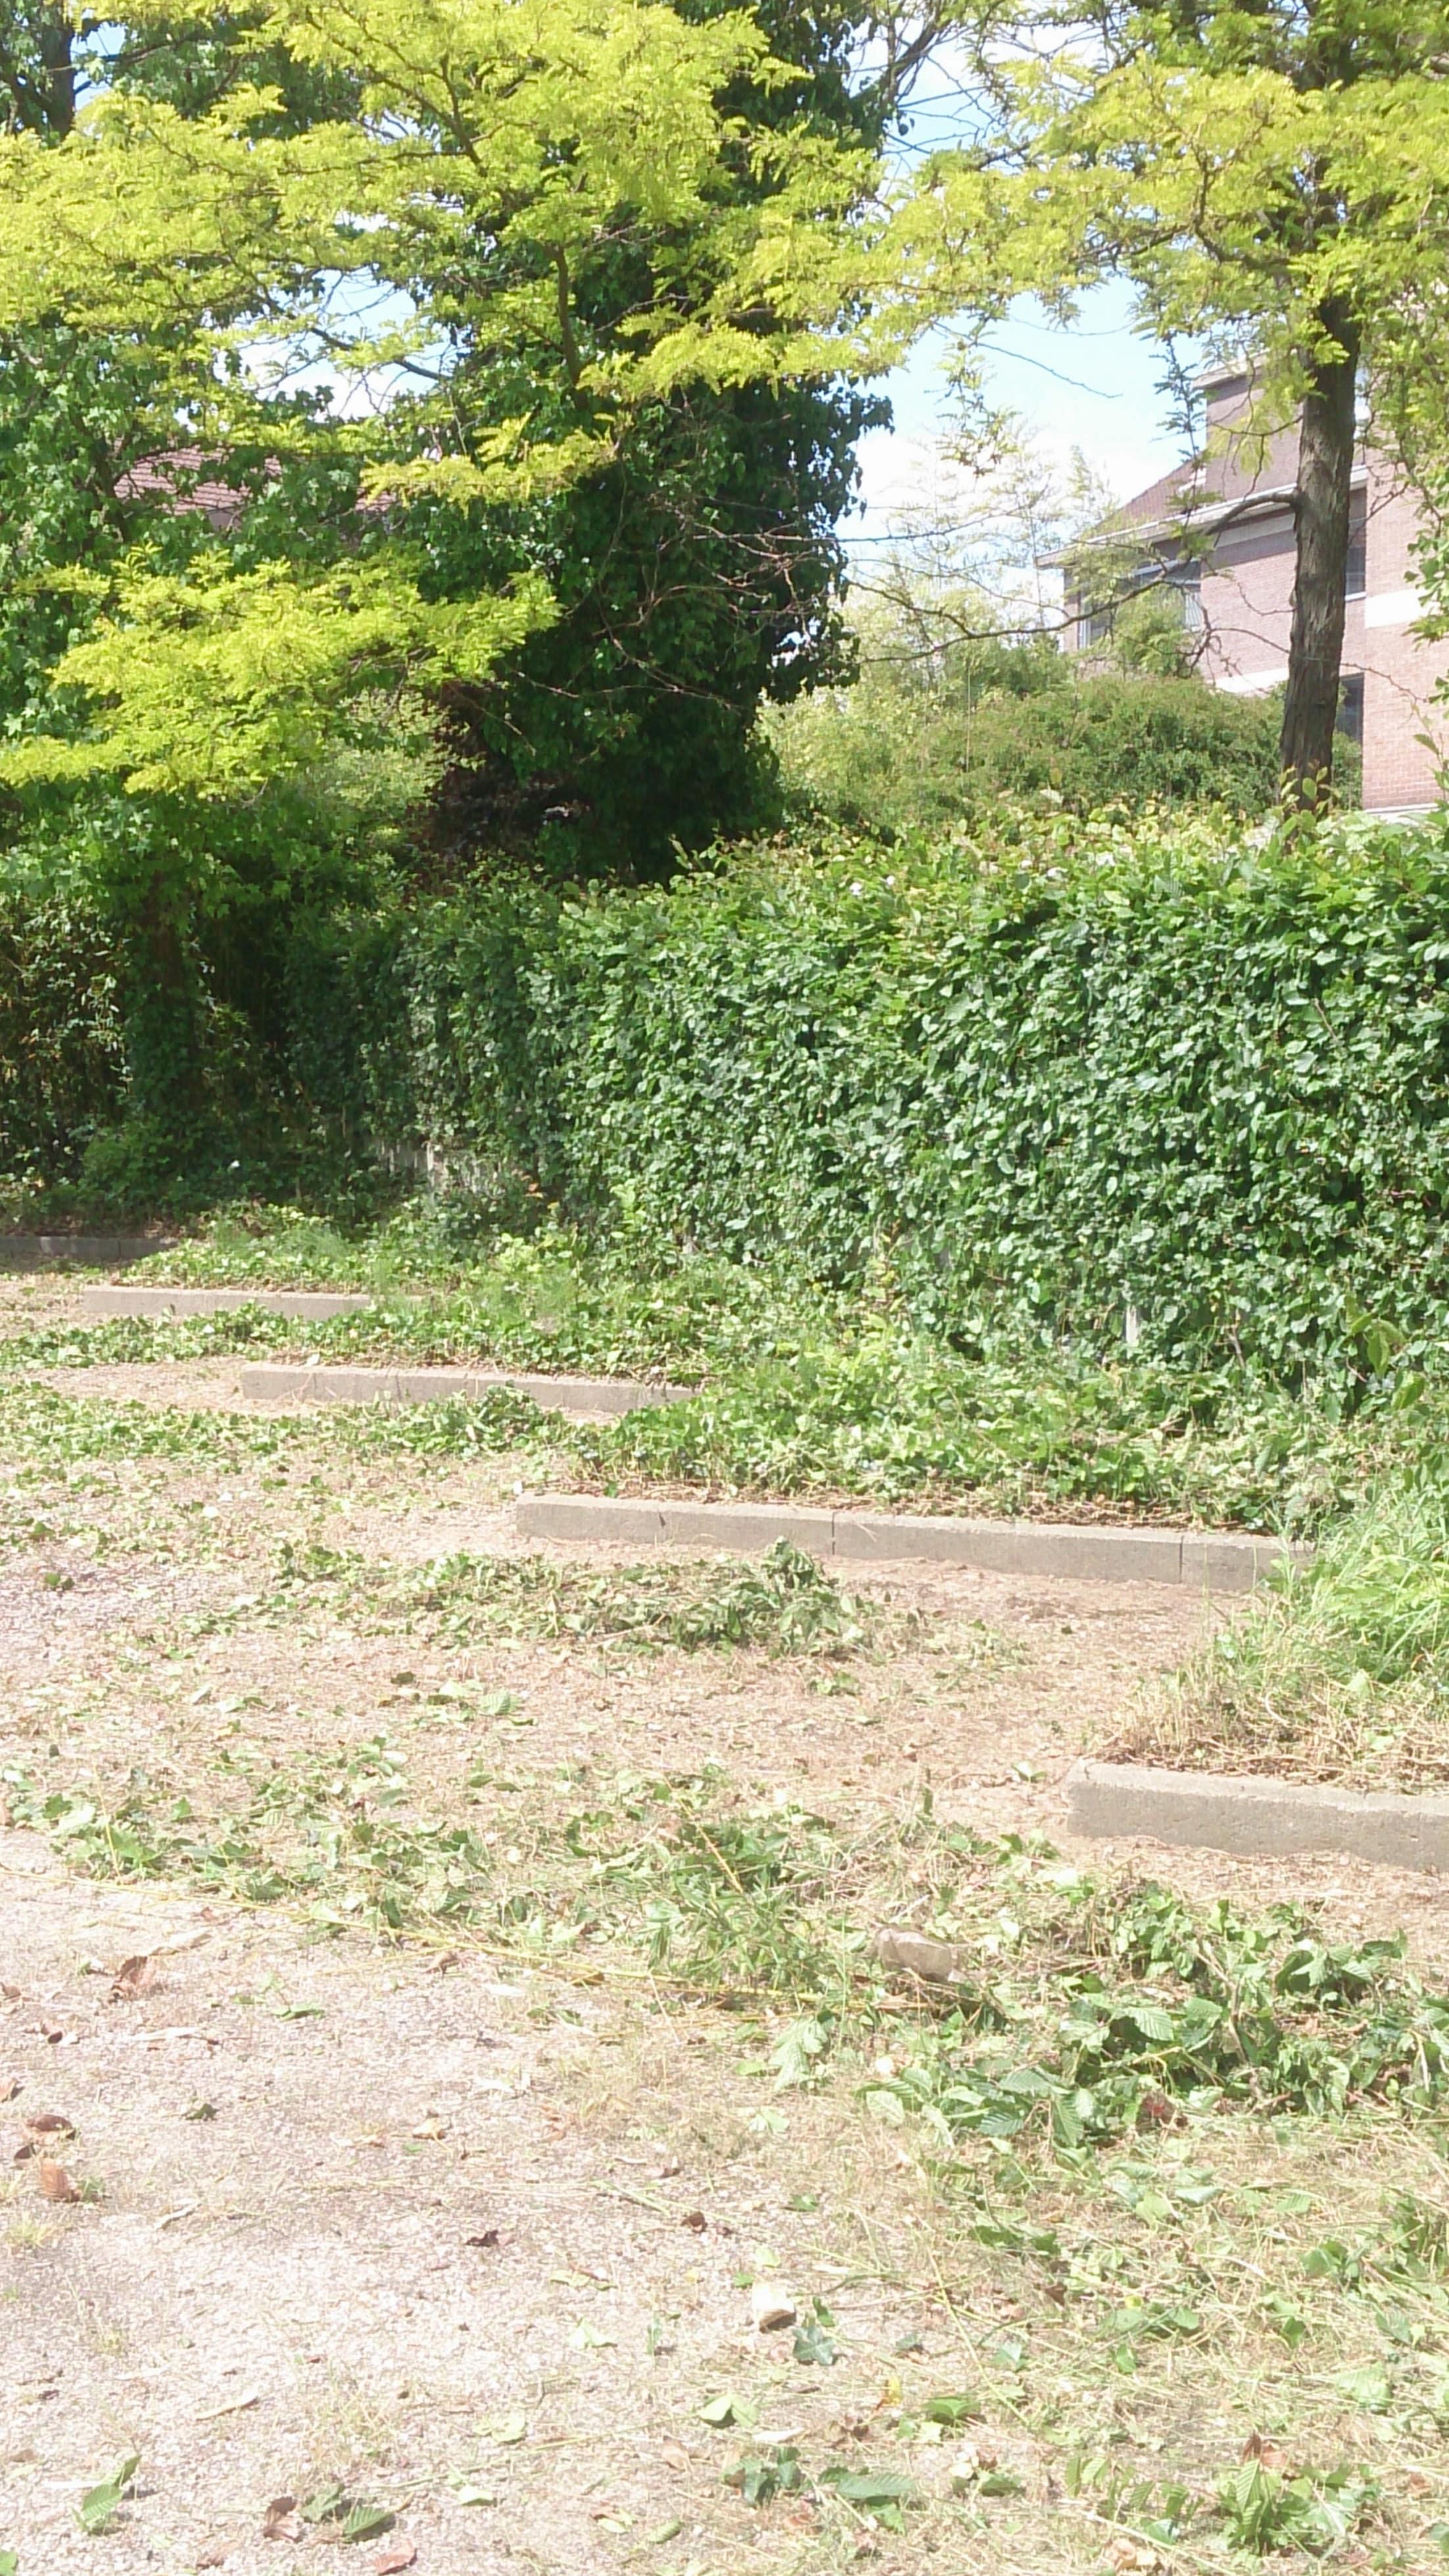 Entreprise archives plaisir vert jardinier paysagiste for Entreprise jardinier paysagiste